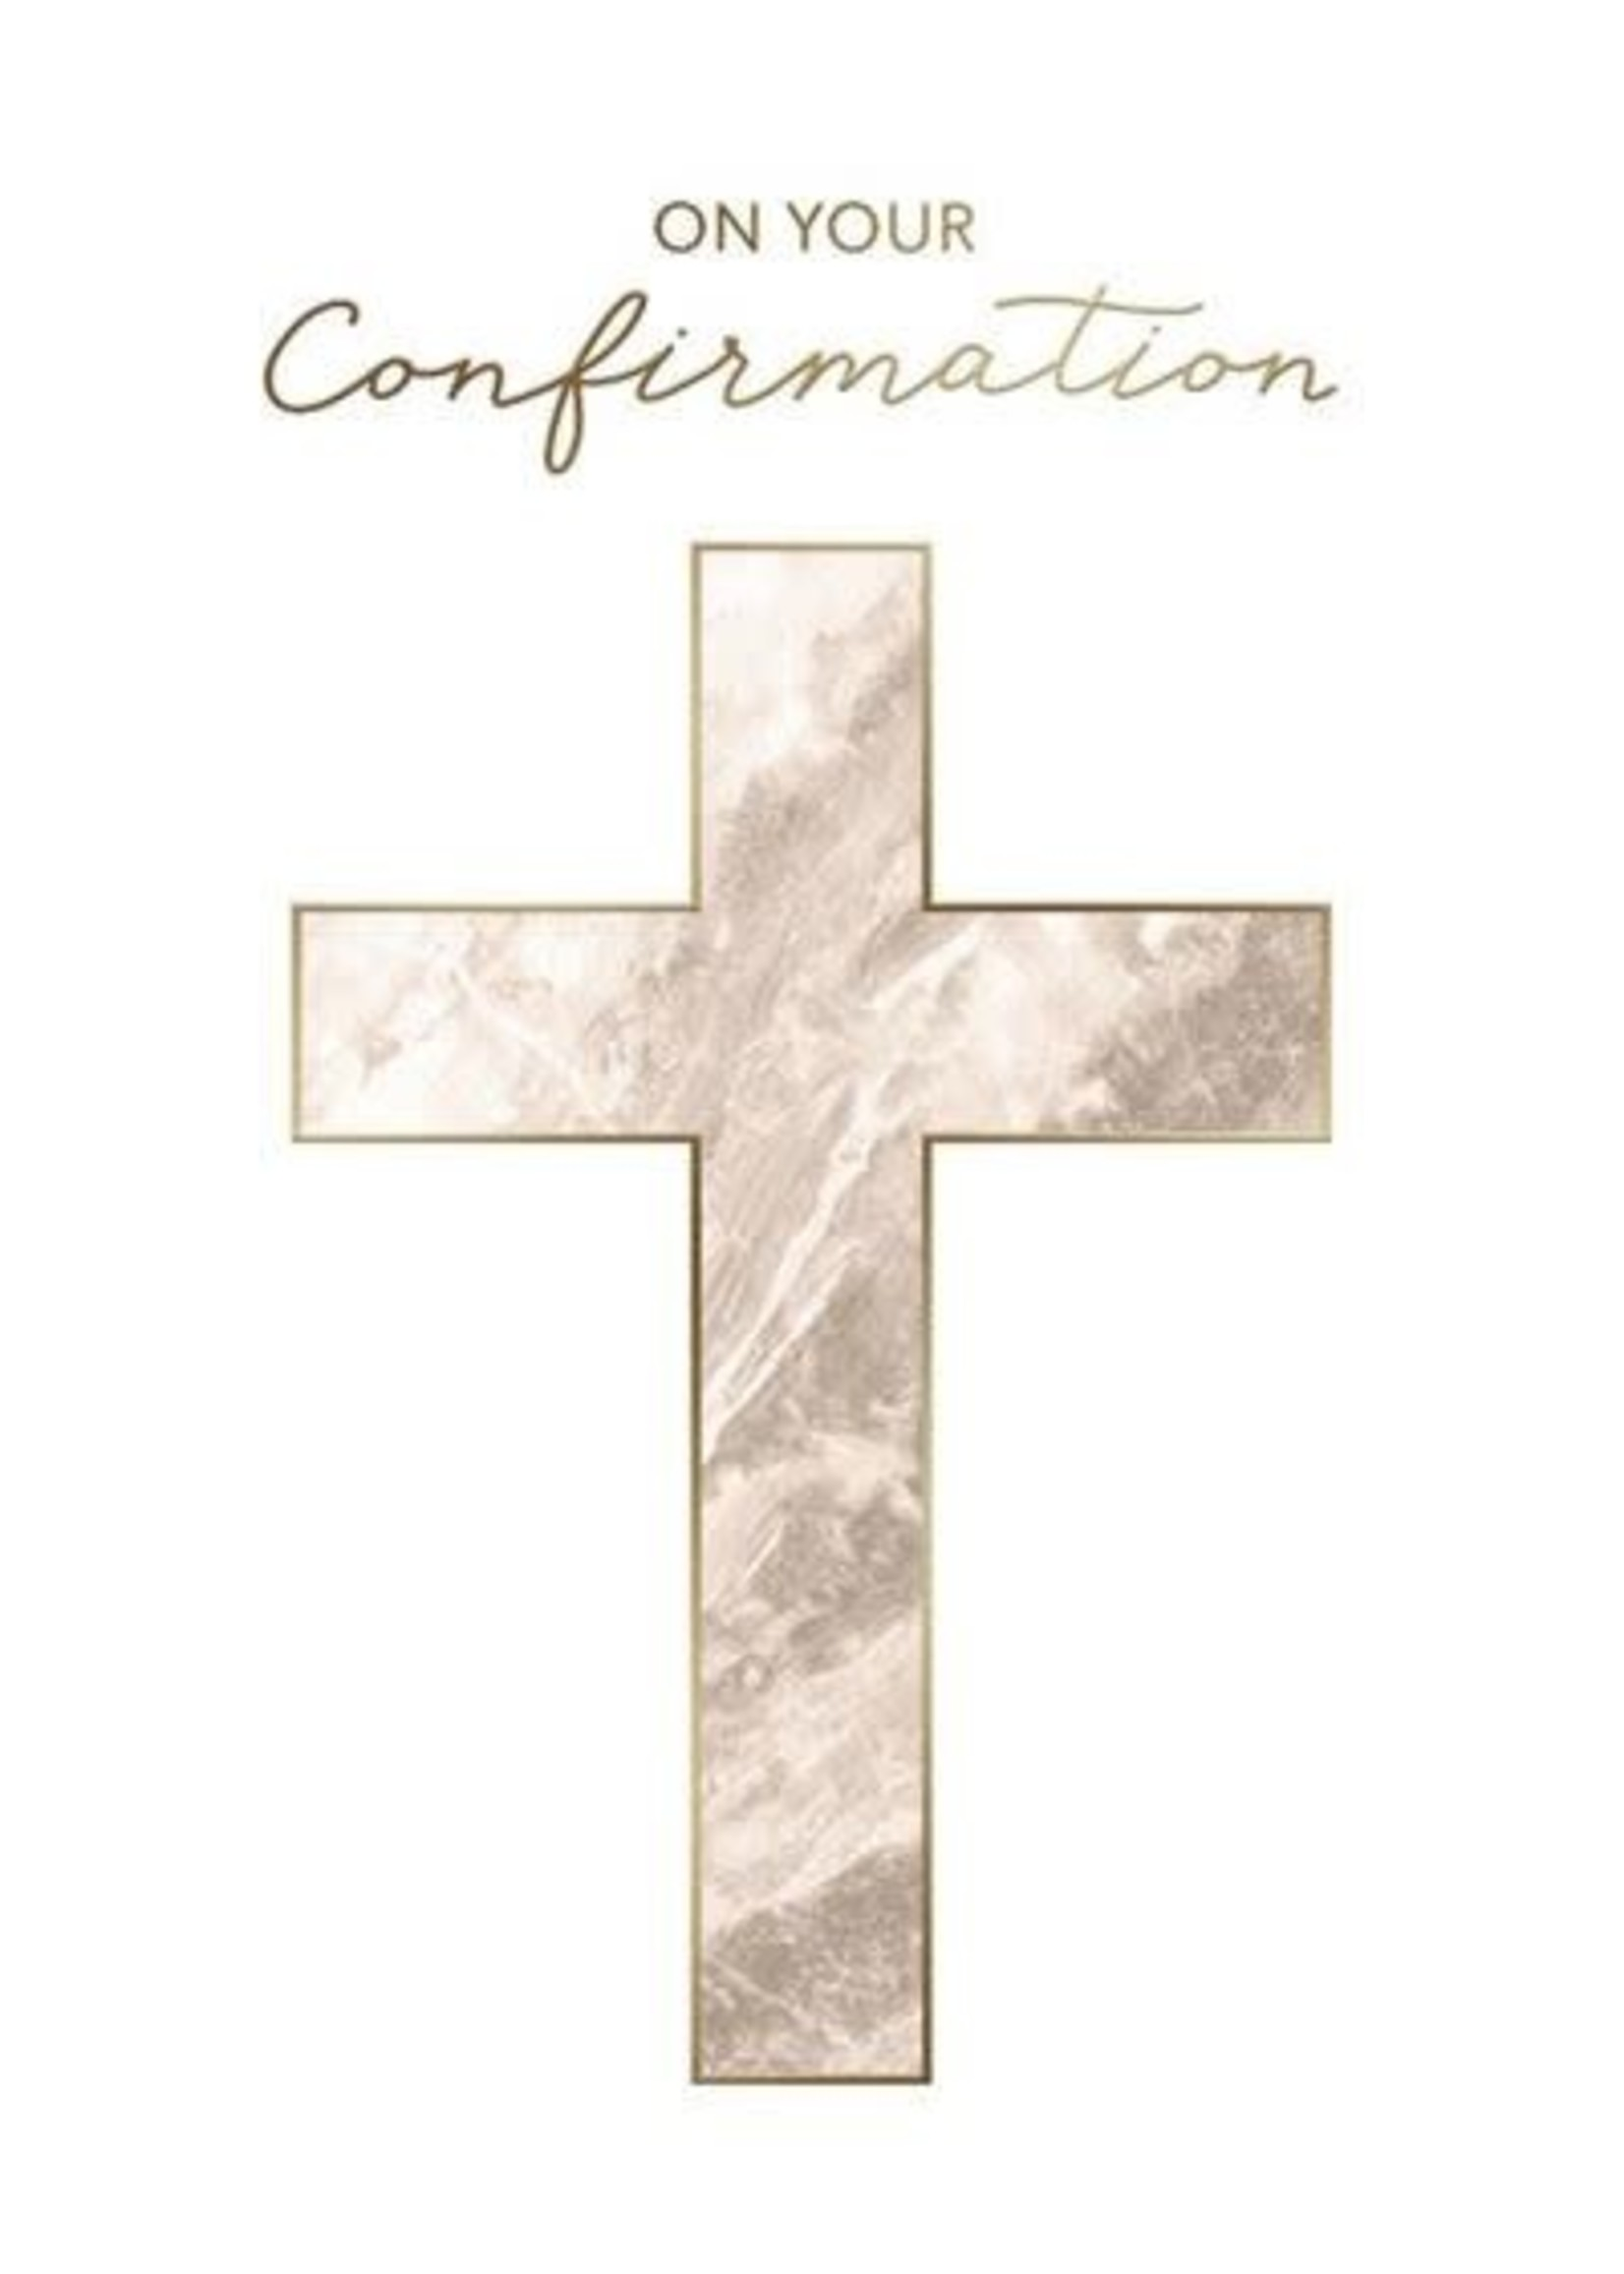 Design Design Marble Cross Confirmation Card